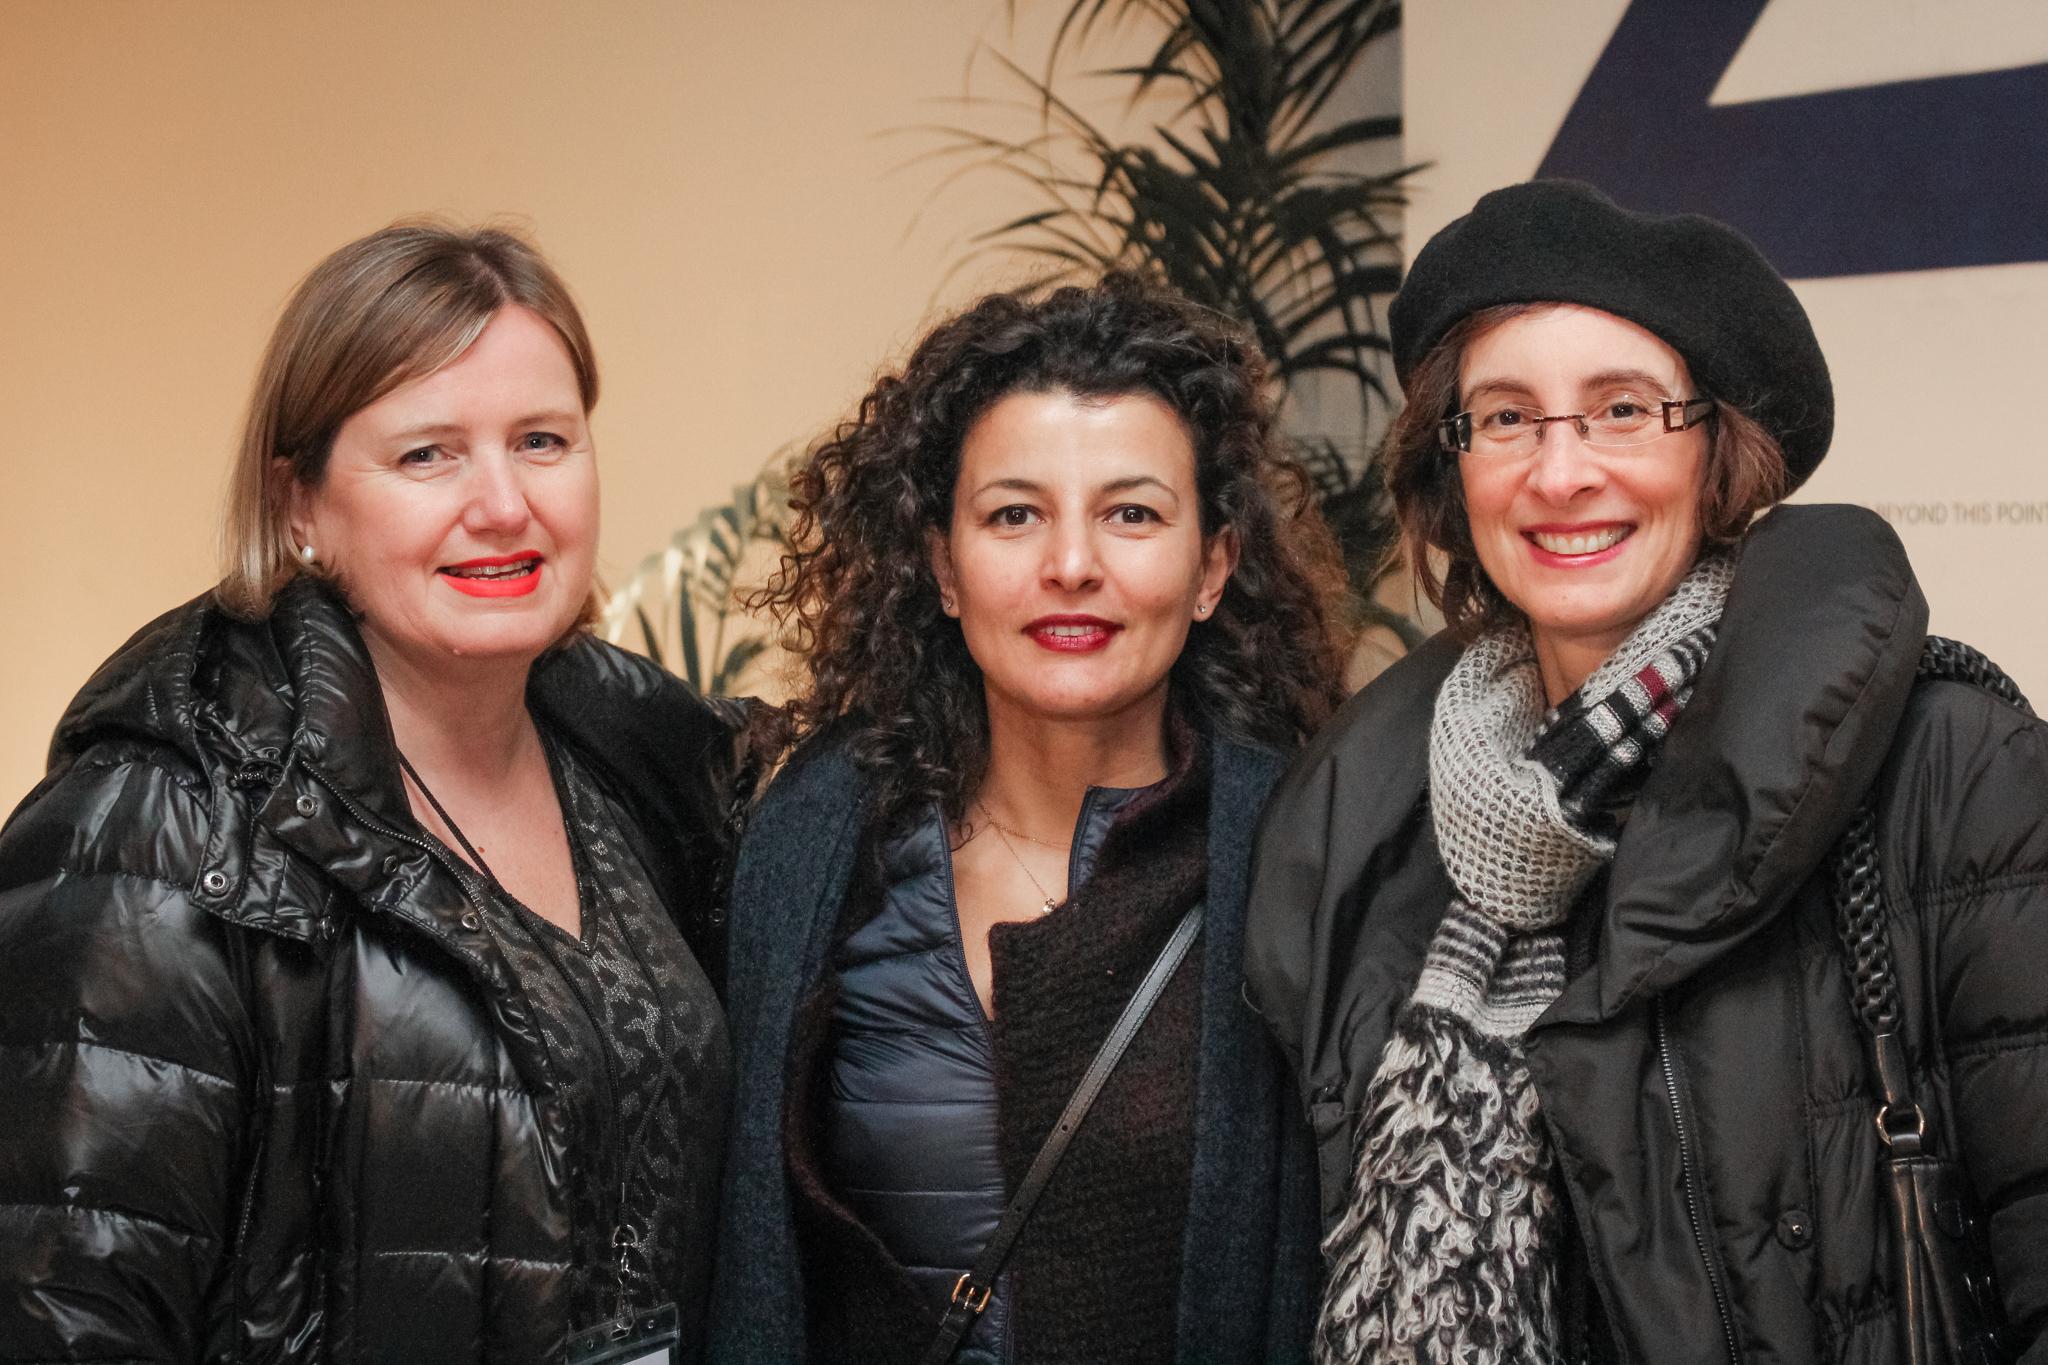 Julie Lomax, Fatoş Üstek,and Tina Sotiriadi